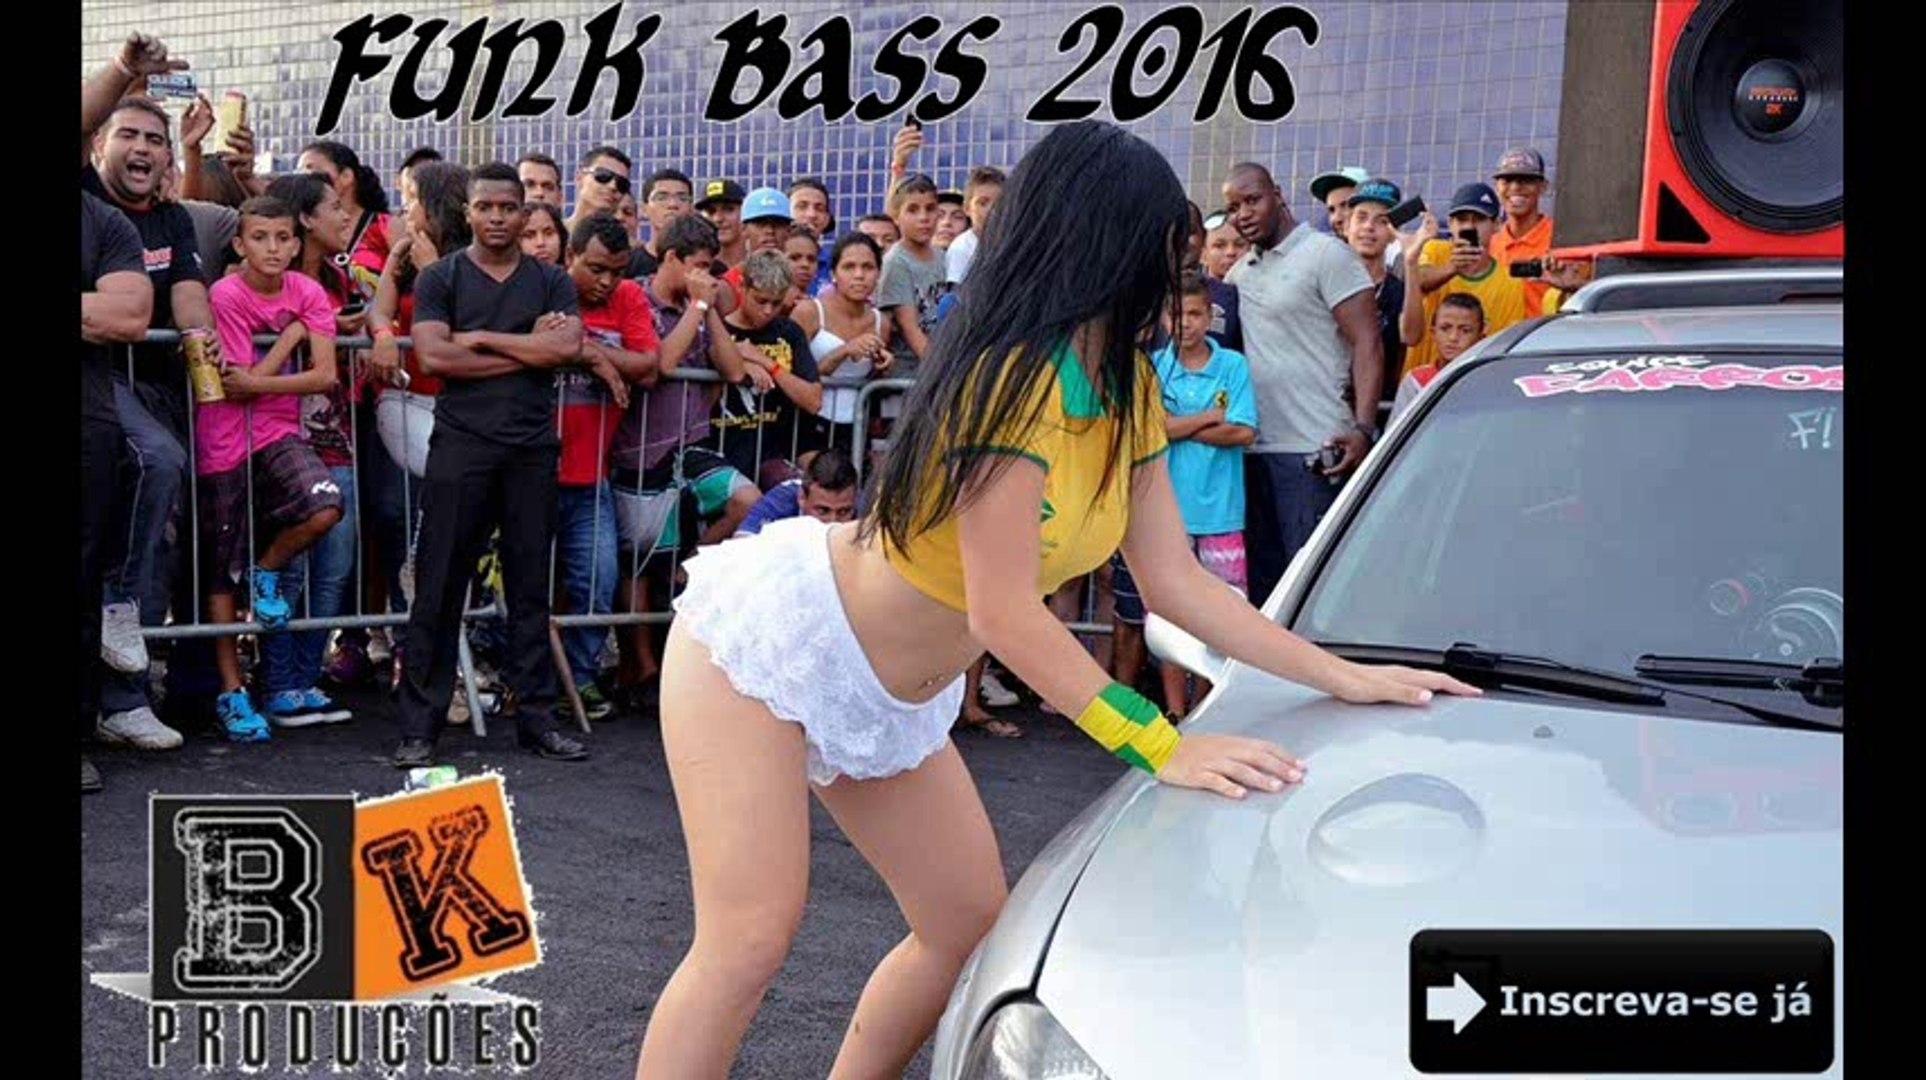 funk bass paredao